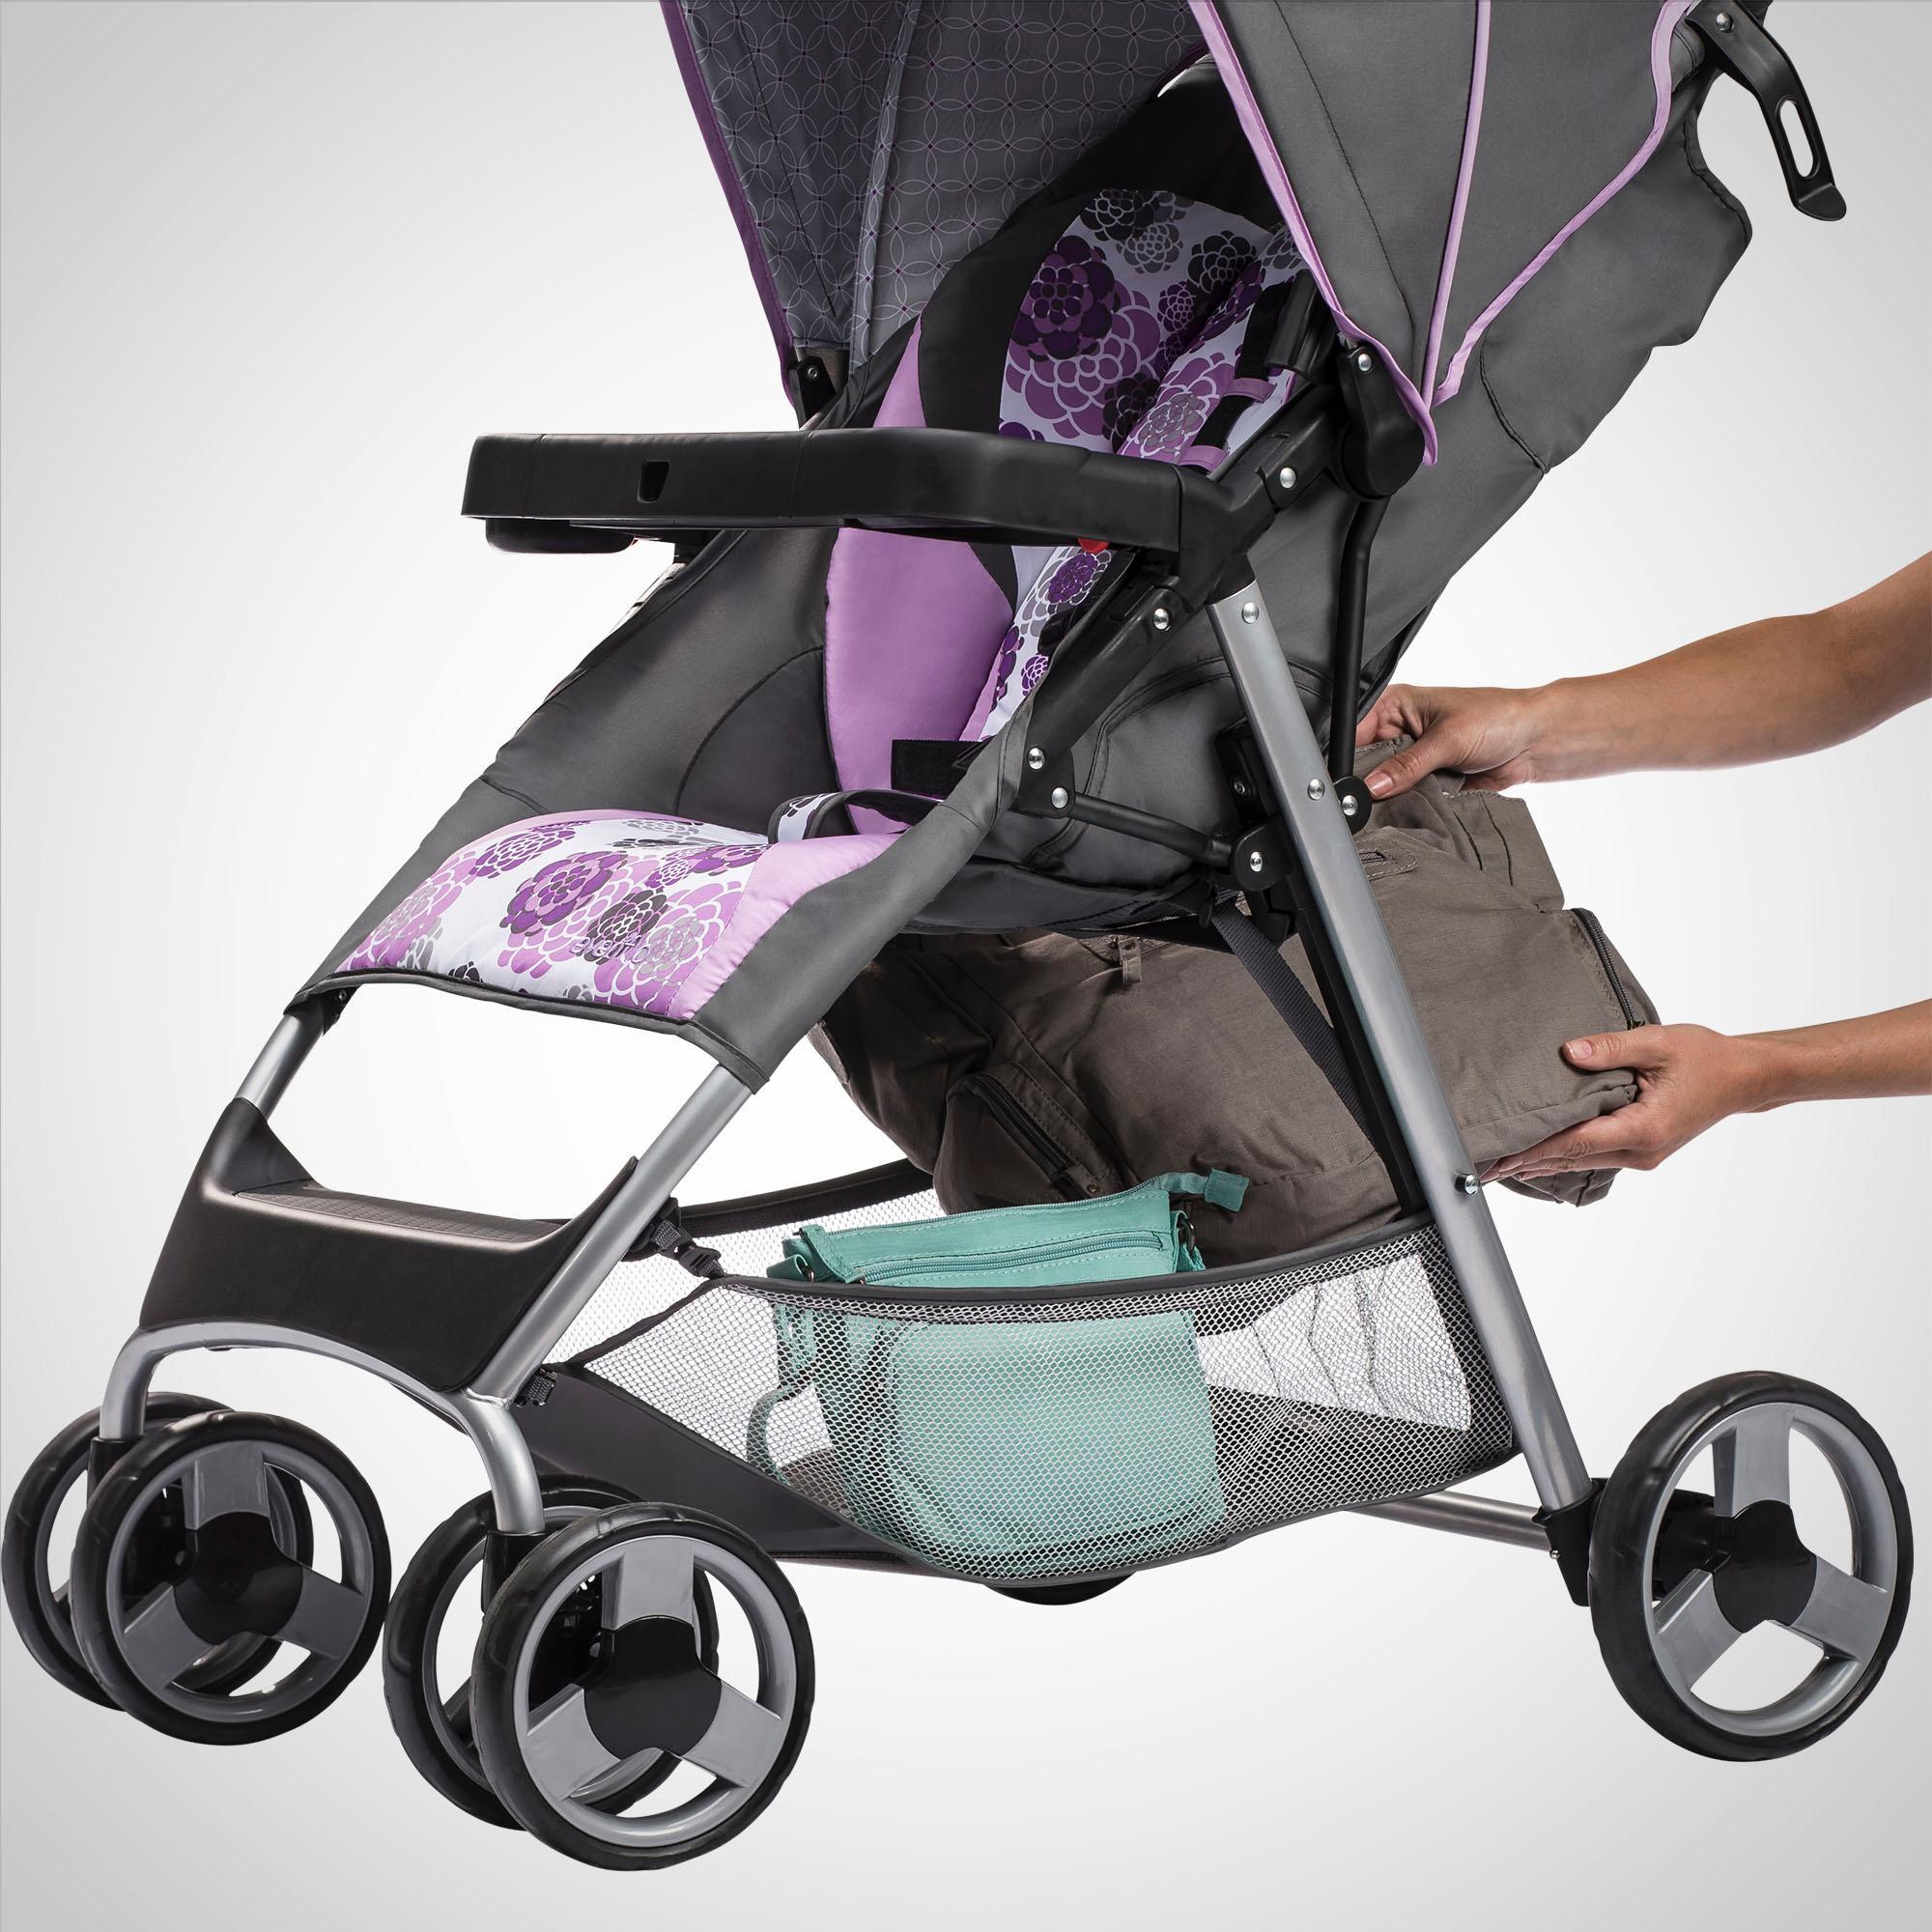 Amazon.com : Evenflo FlexLite Travel System, Raleigh : Baby